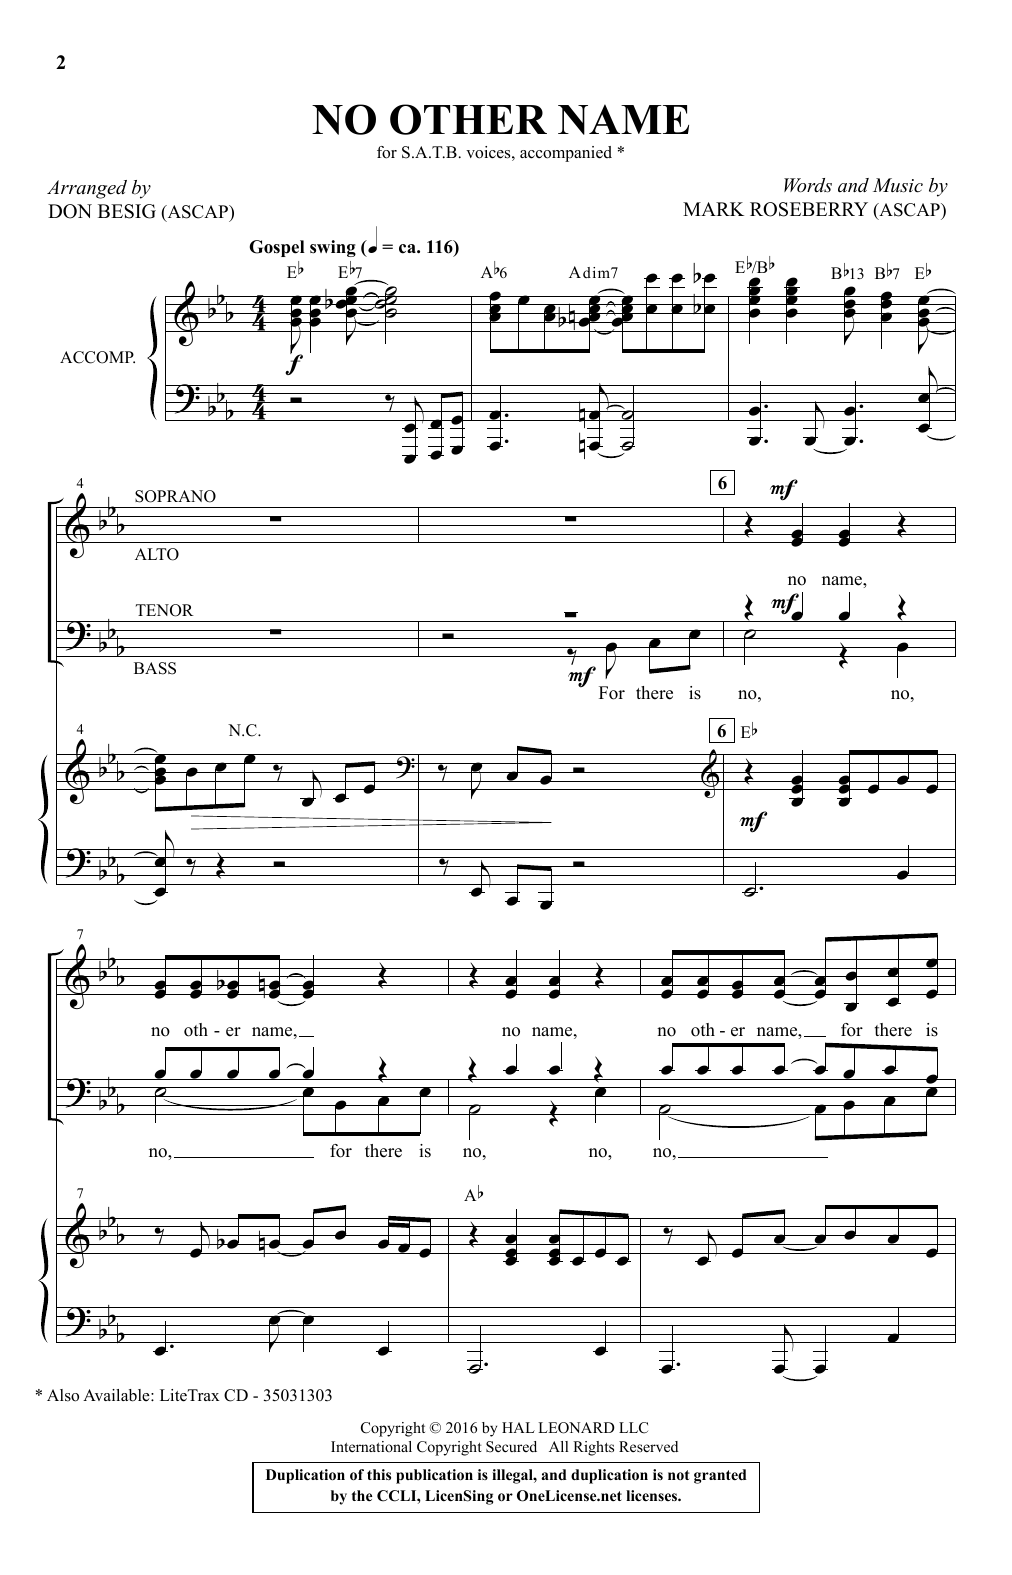 Don Besig 'No Other Name' Sheet Music Notes, Chords   Download Printable  SATB   SKU 15